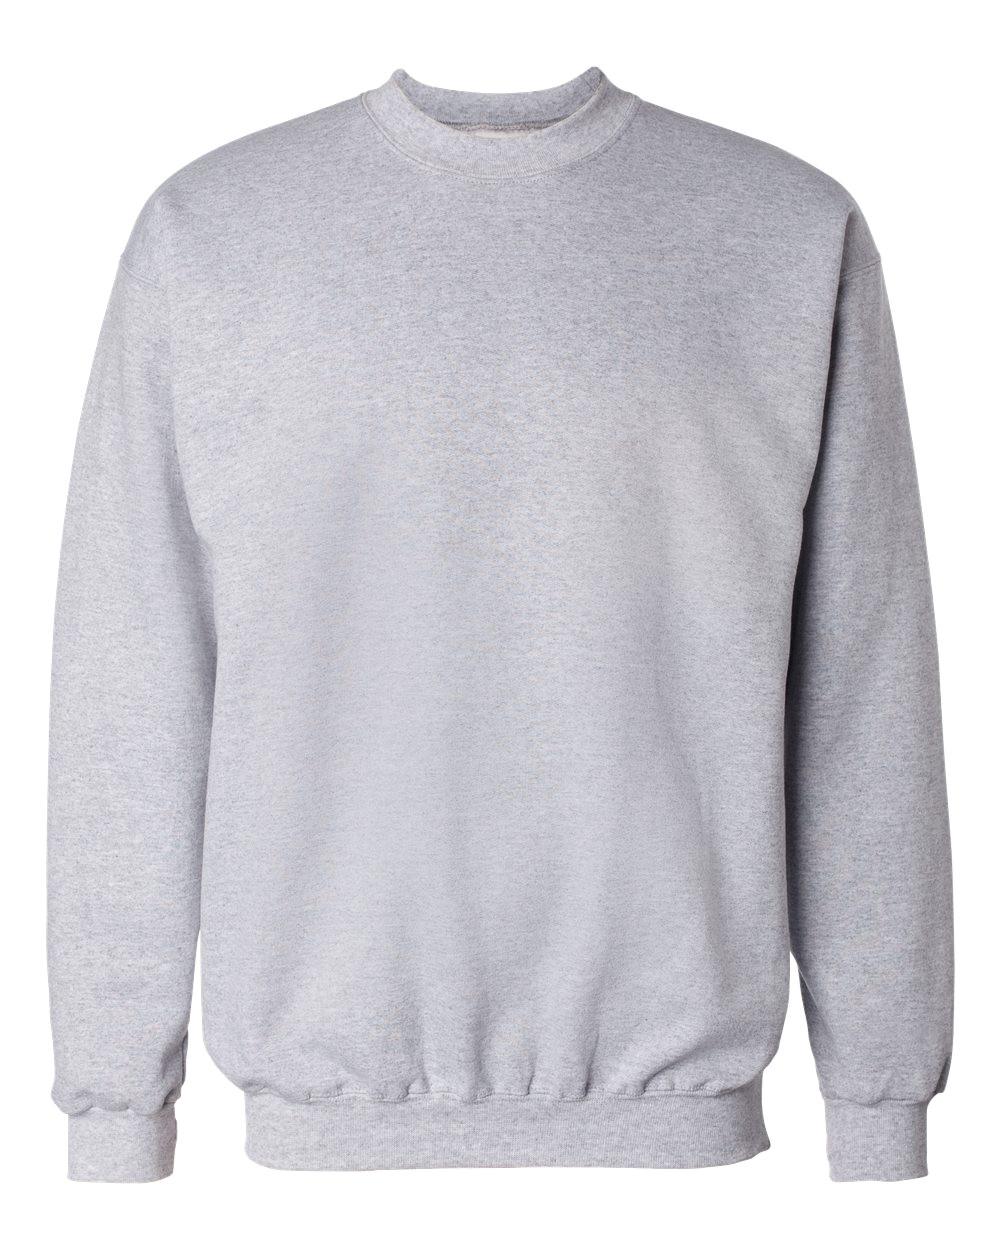 Sweater Template Photoshop Hanes Printproxp Ultimate Cotton Crewneck Sweatshirt